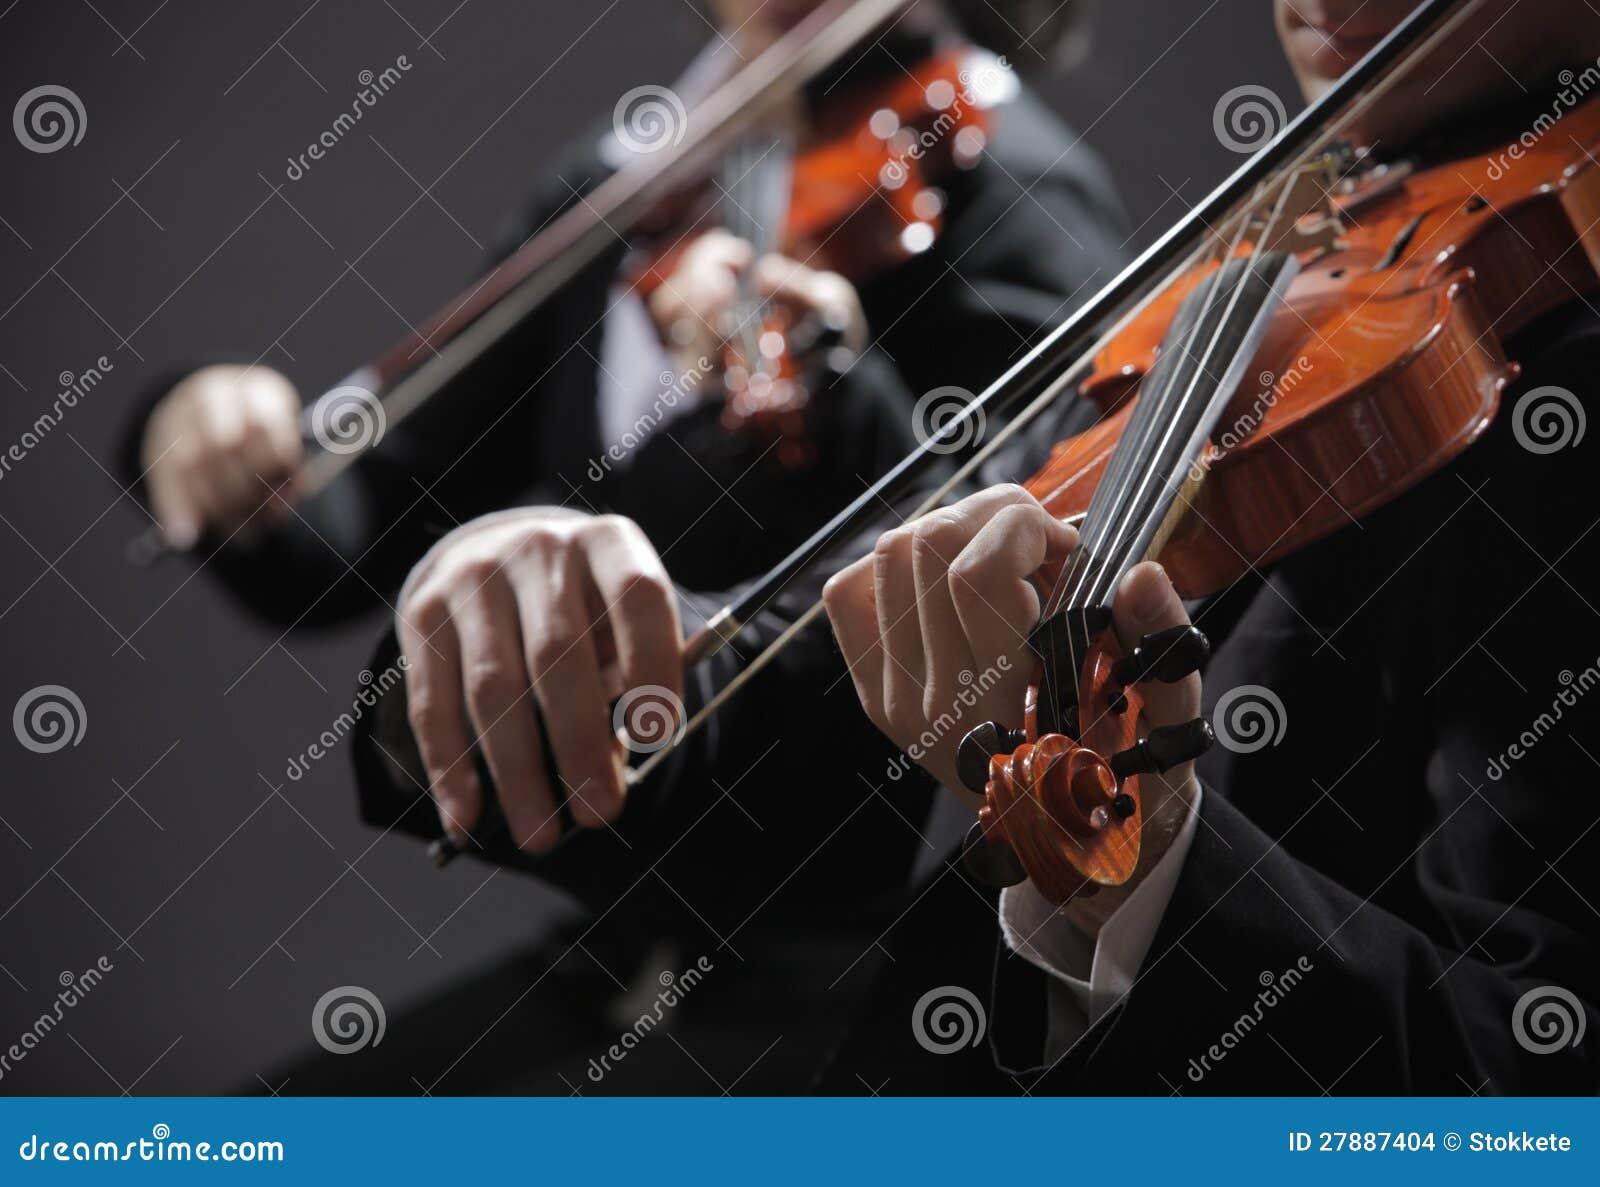 Música clássica. Violinistas no concerto